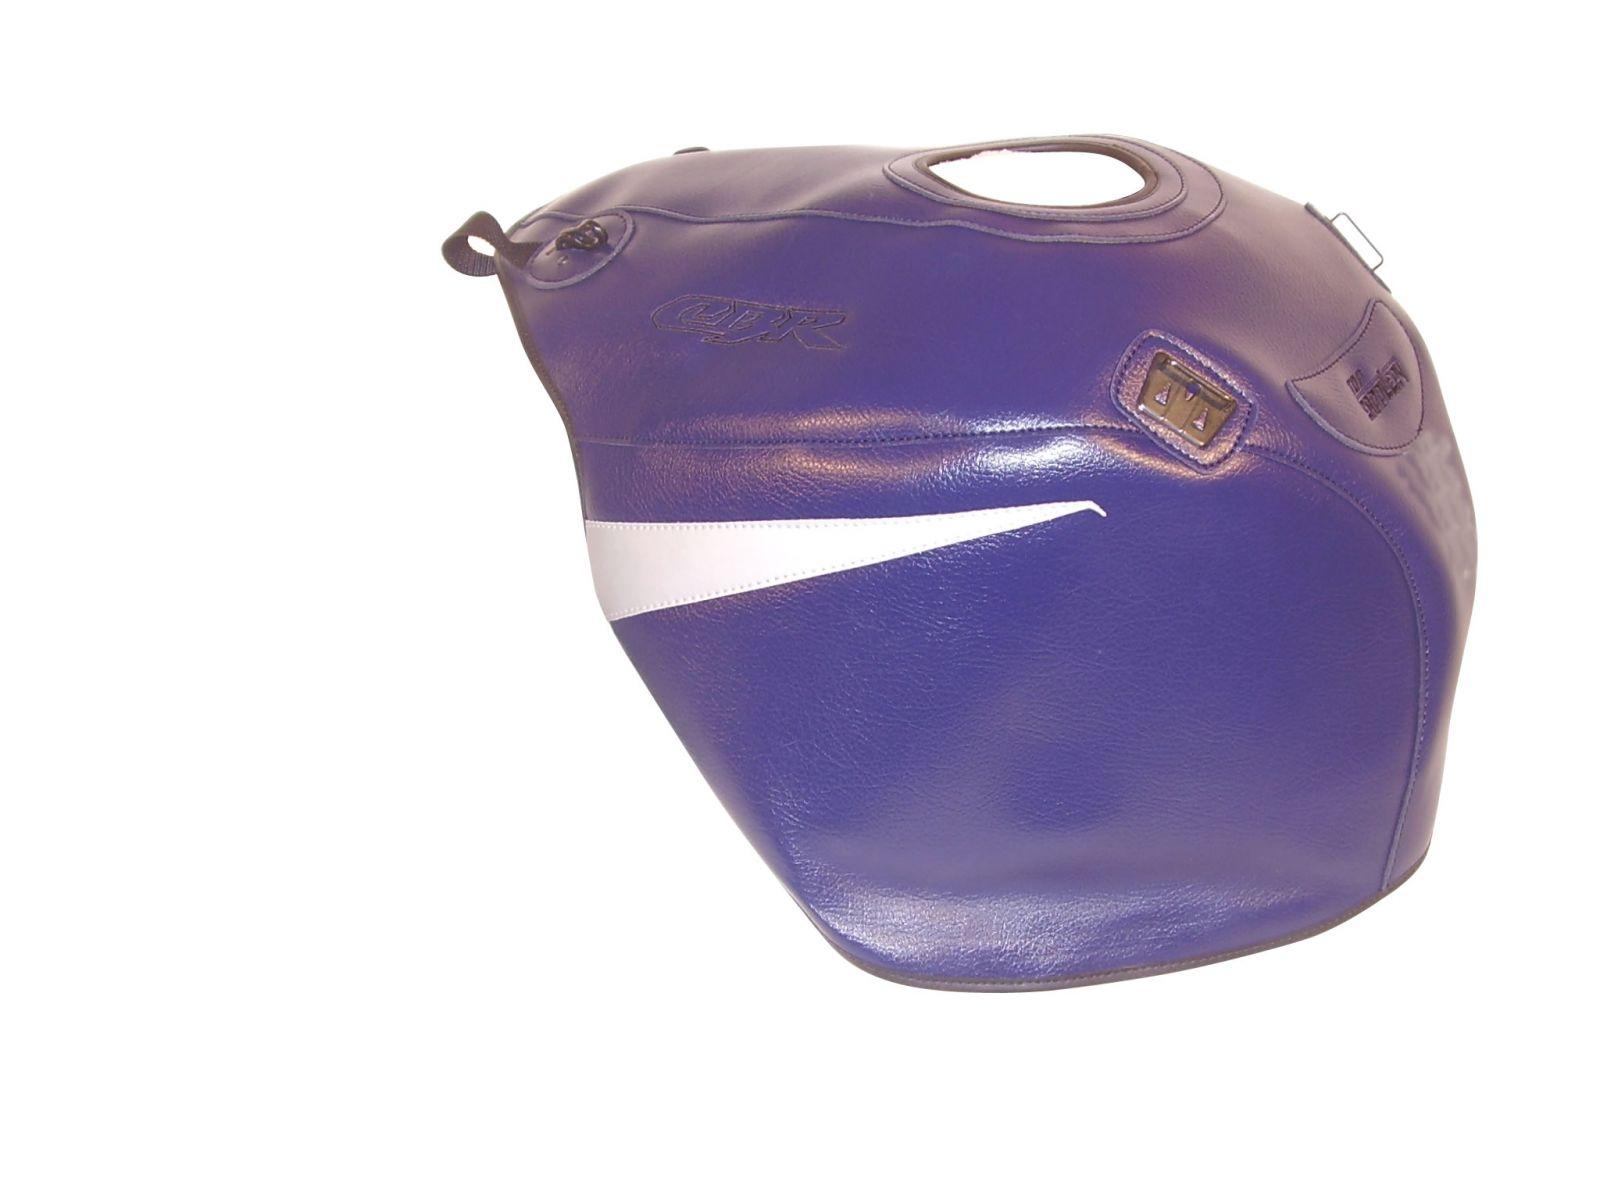 Capa de depósito TPR2709 - HONDA CBR 600 F [1999-2007]